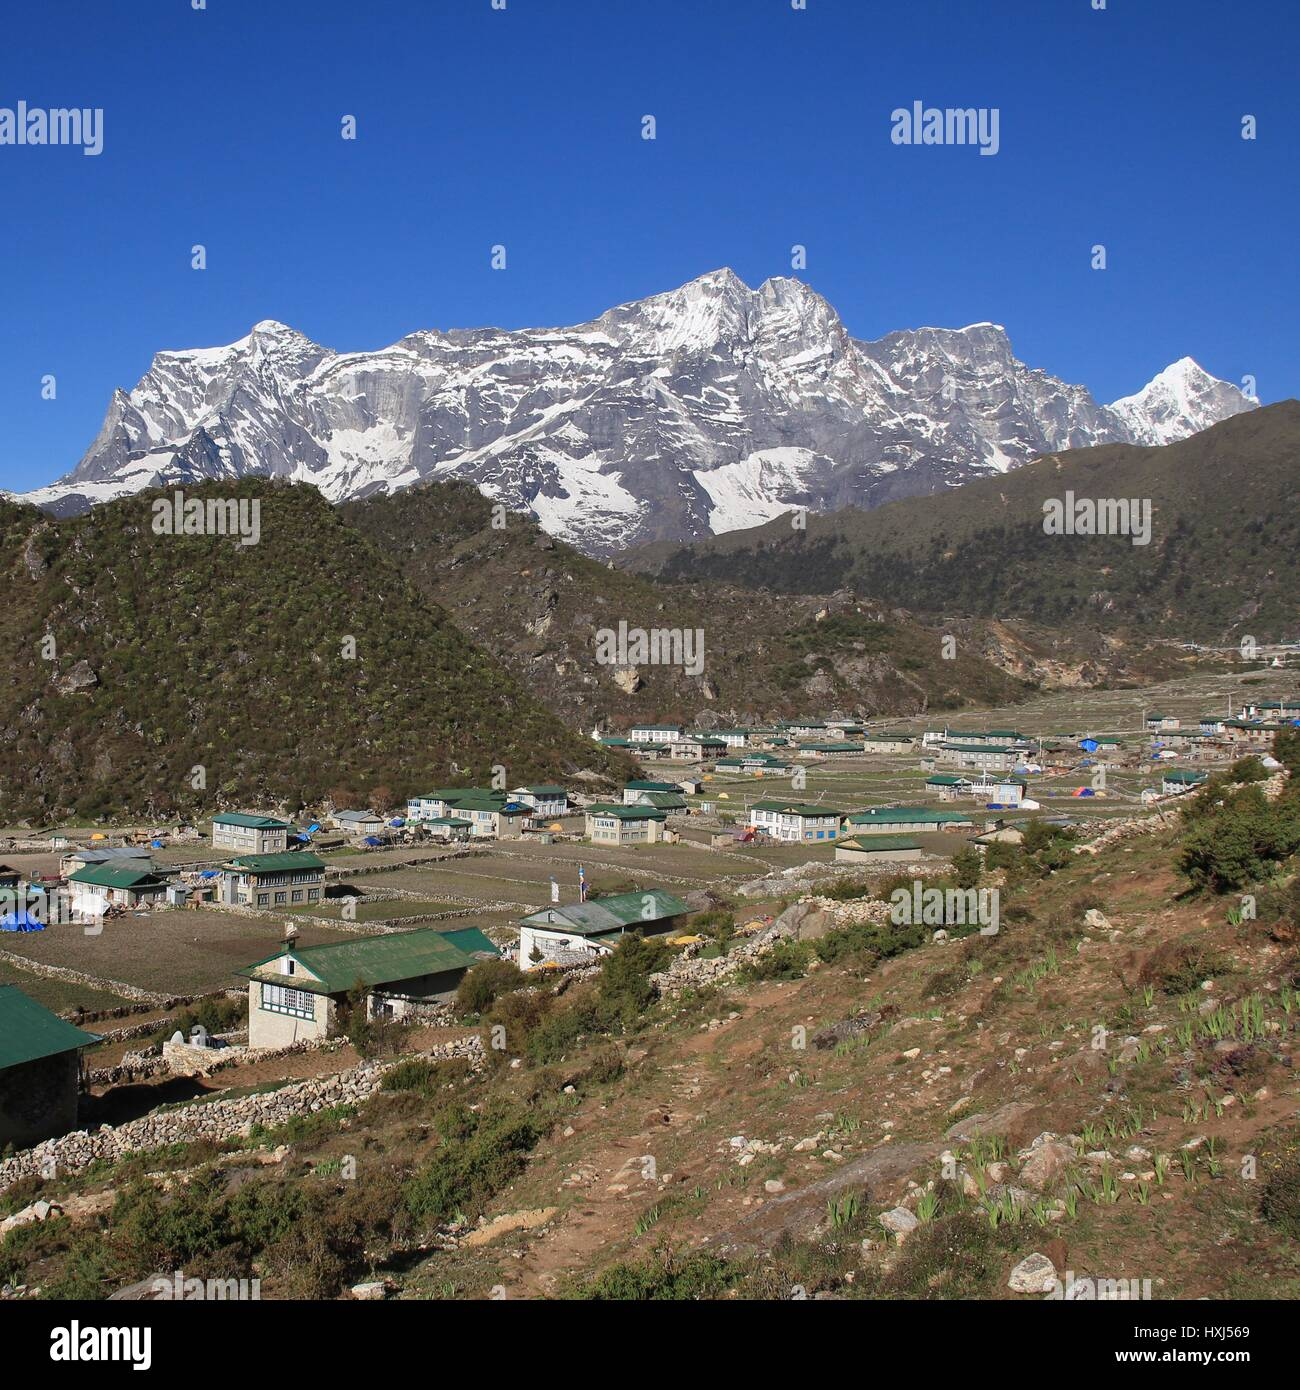 Sherpa village Khumjung. - Stock Image